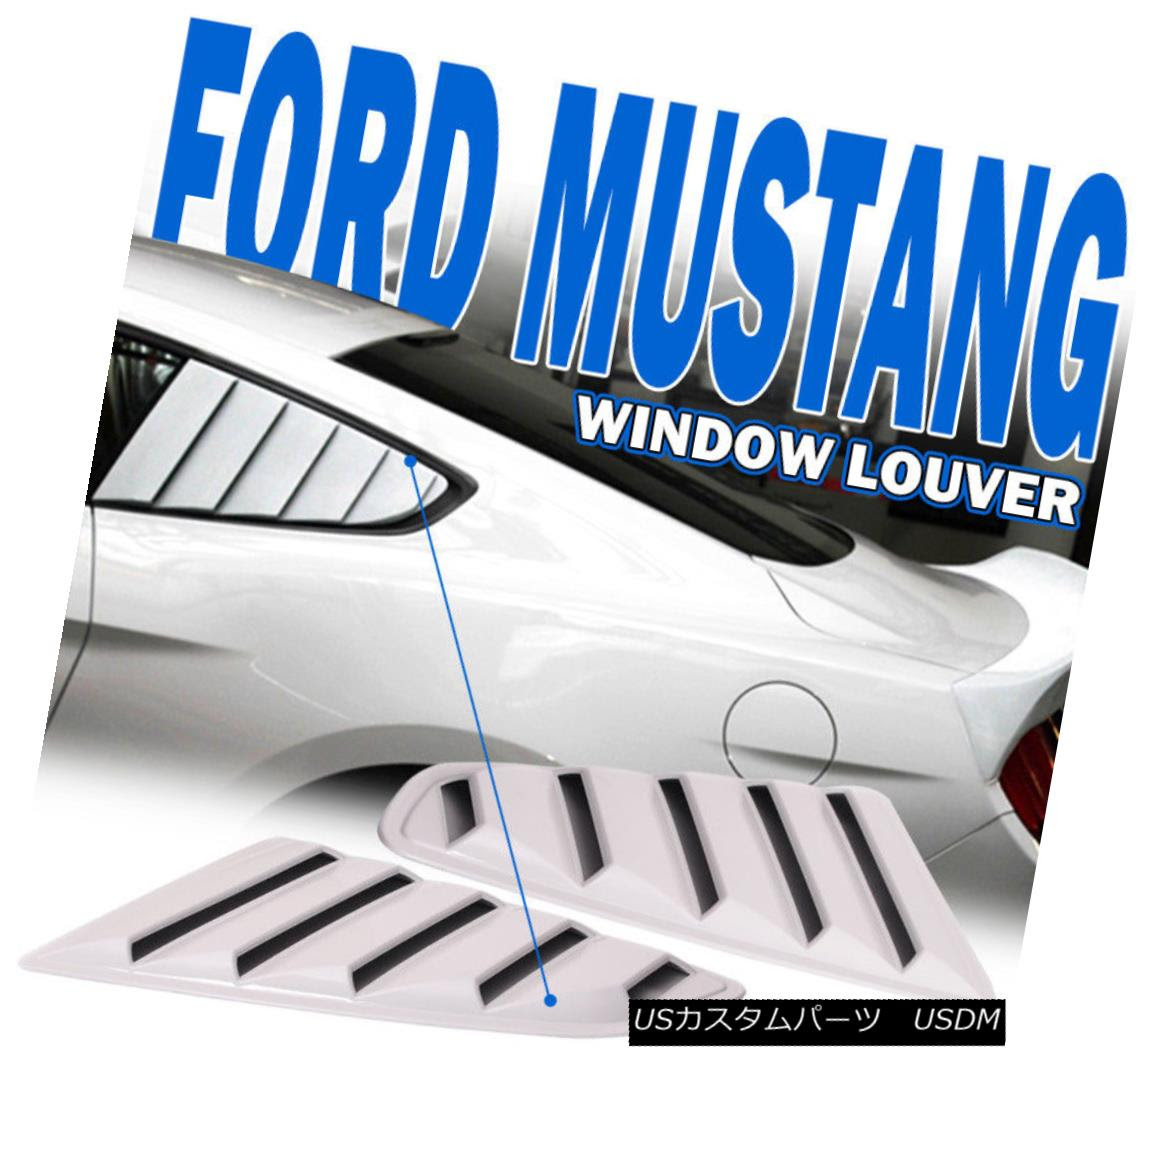 Fits Style その他 車用品 15 17 エアロパーツ Ford Mustang Oe 18 Painted White Oxford Yz Window Louver Pp フィット15 17 18フォードマスタングoeスタイル塗装 Yzオックスフォードホワイトウィンドウルーバー Pp World倉庫 店車用品 バイク用品 車用品